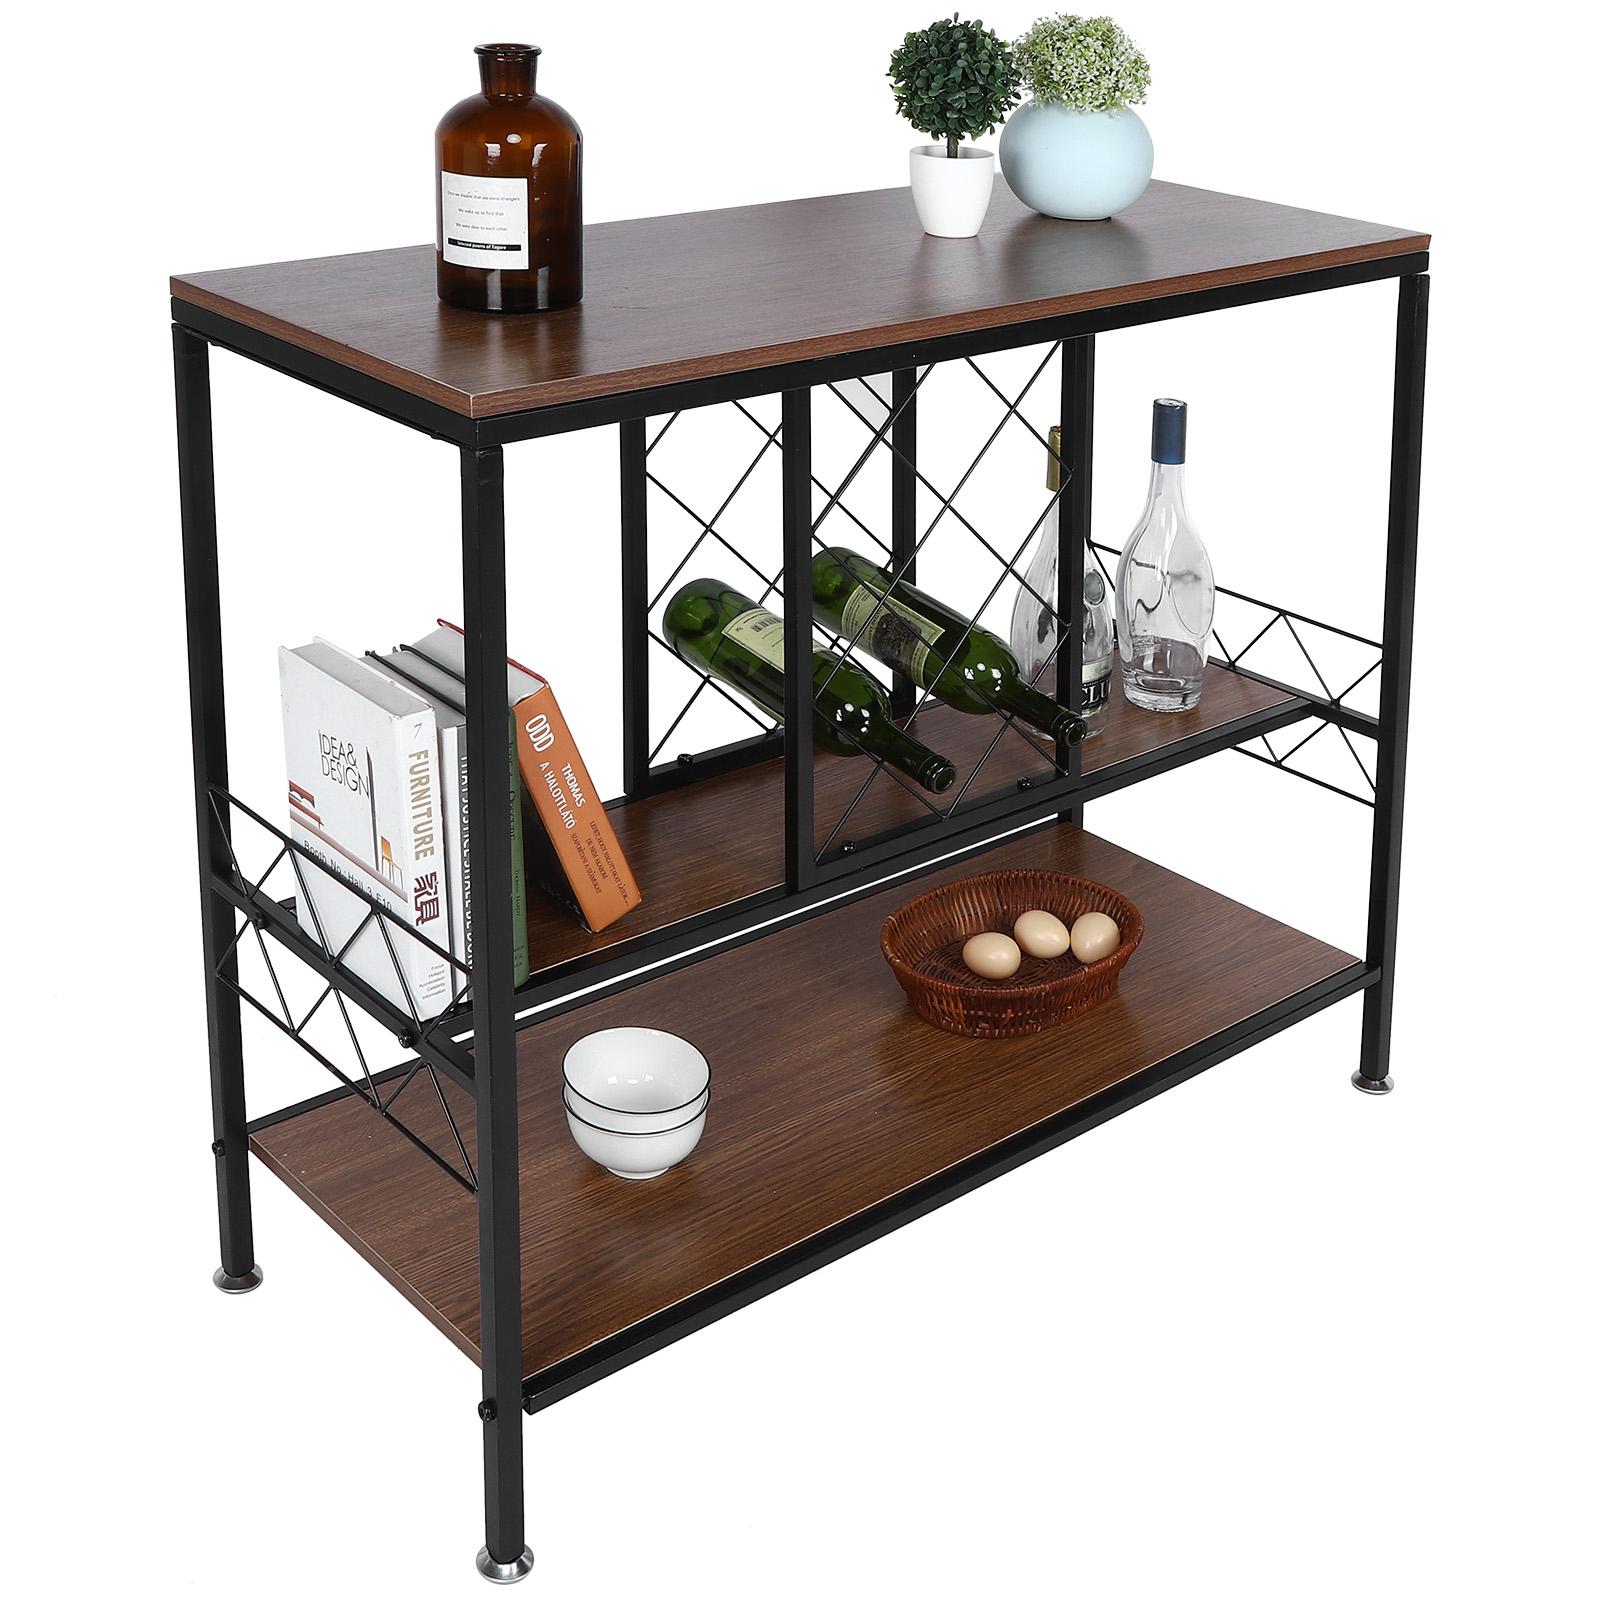 amonida 3 layer wine rack table with glass holder wine cabinets organizer home living room bar supply 3 layer wine table wine storage table